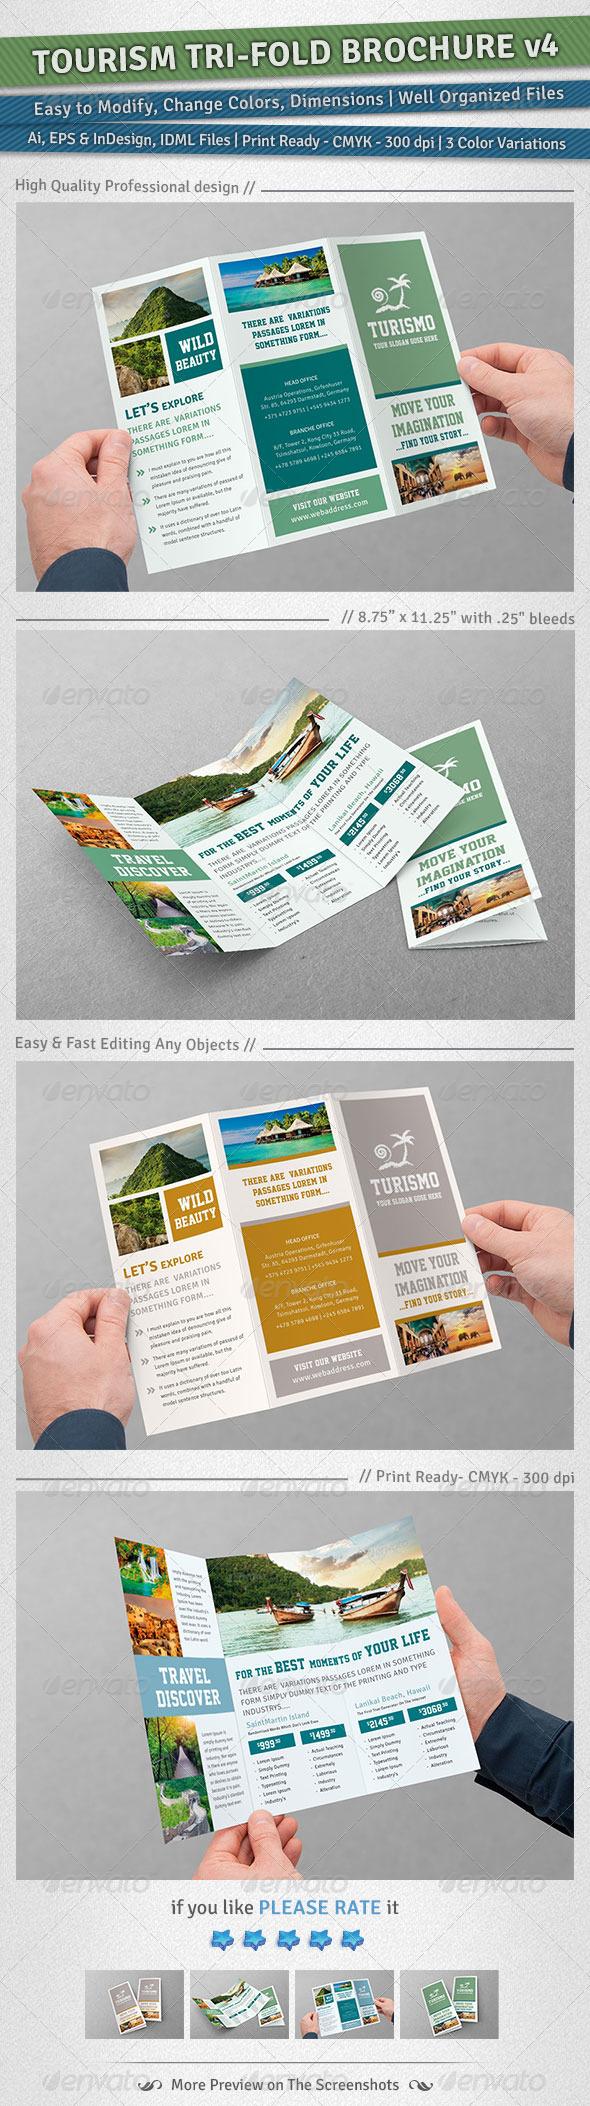 Tourism Tri-Fold Brochure | Volume 4 - Corporate Brochures